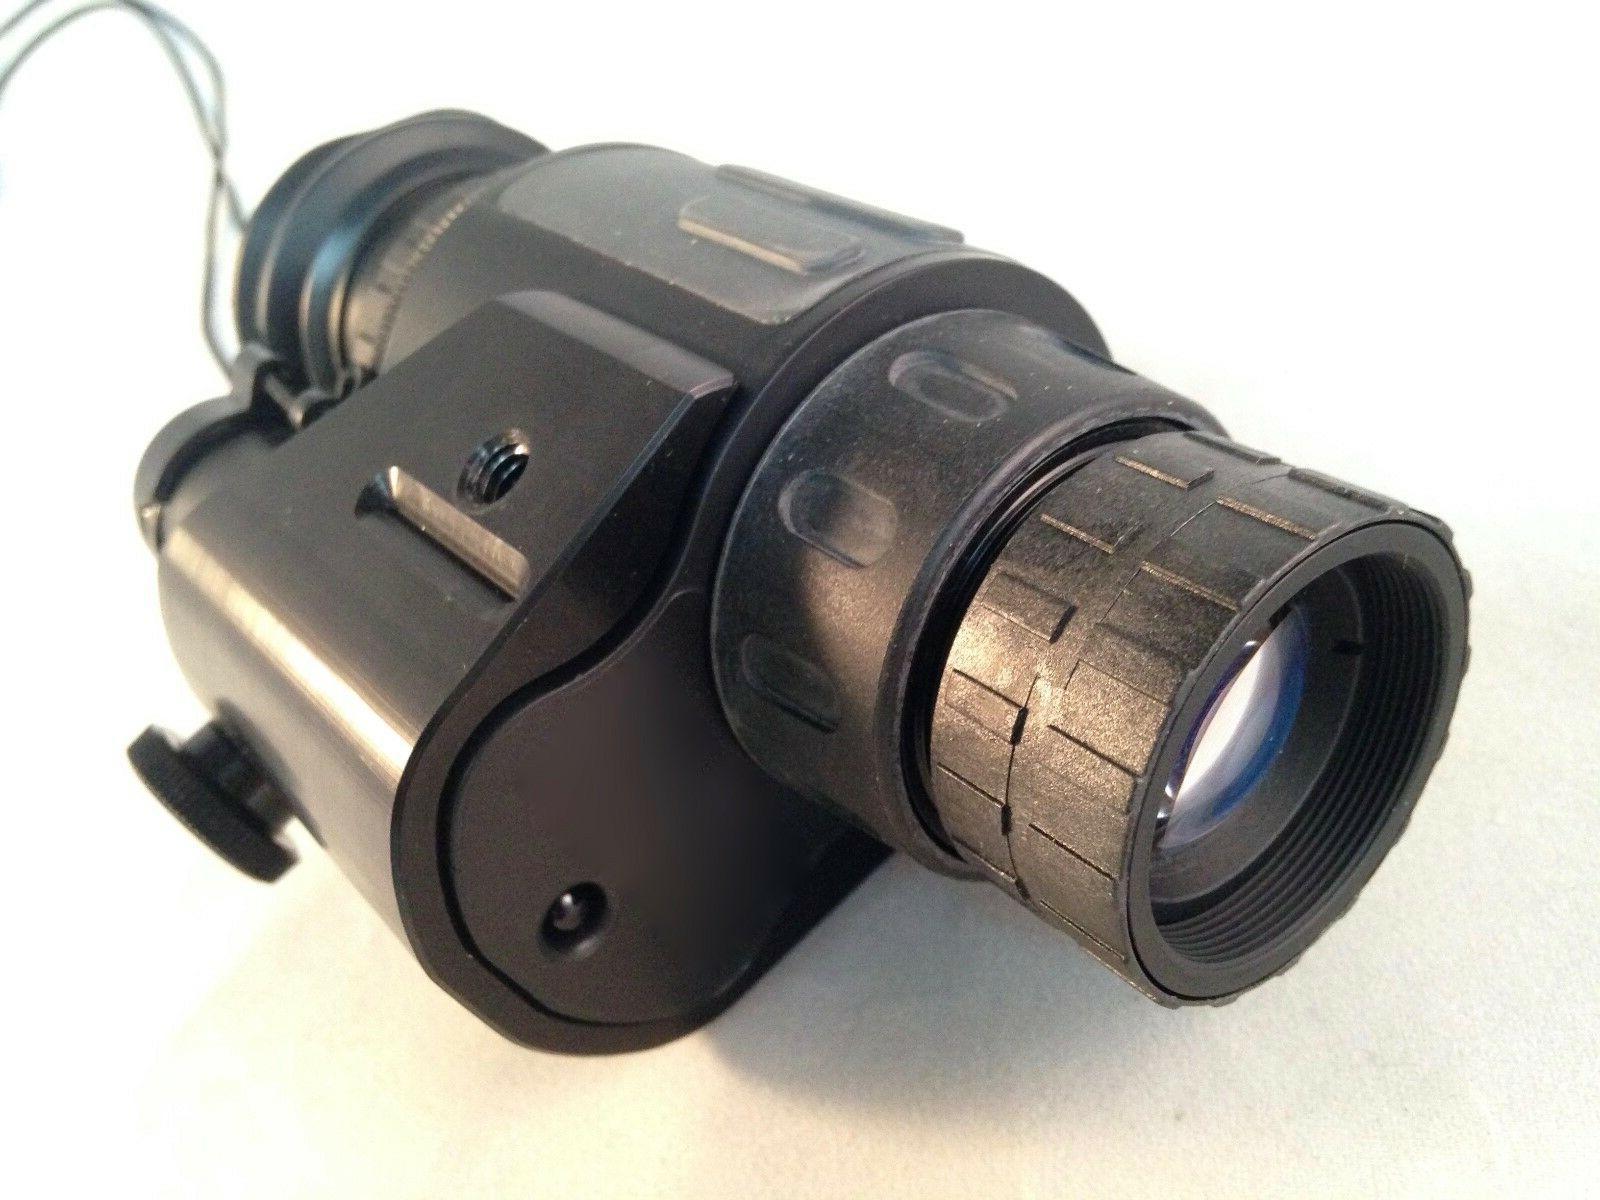 ENVIS Half Mount M703 Night Vision gear